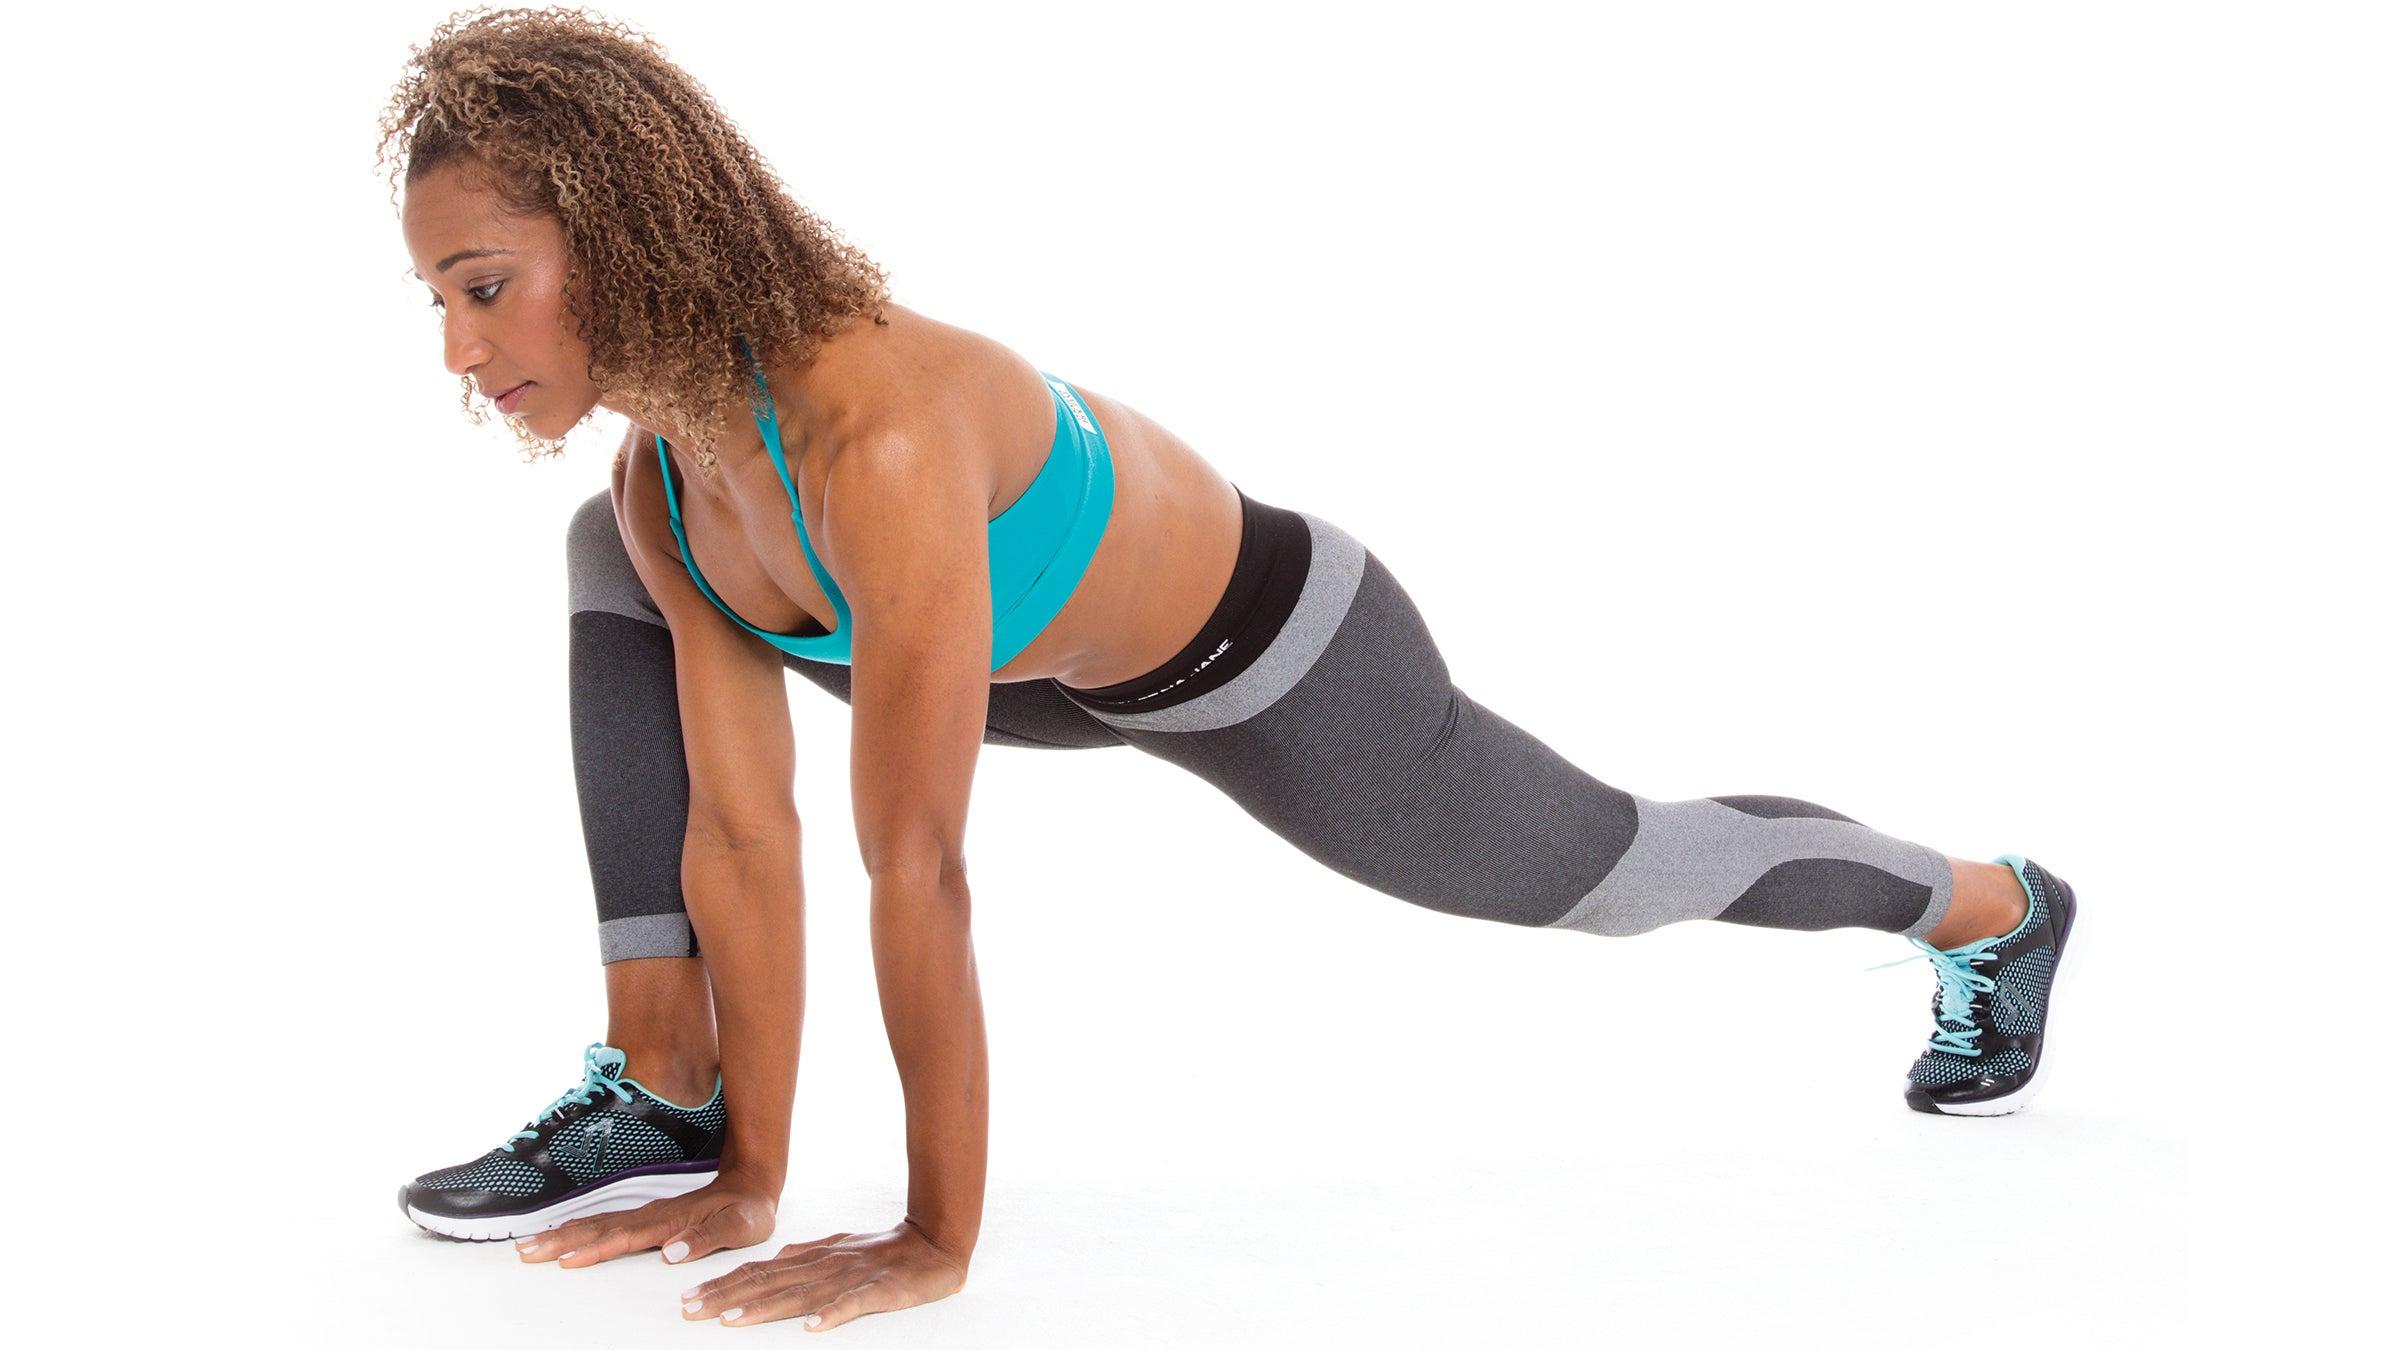 Kneeling Hip-Flexor Stretch/Runner's Lunge